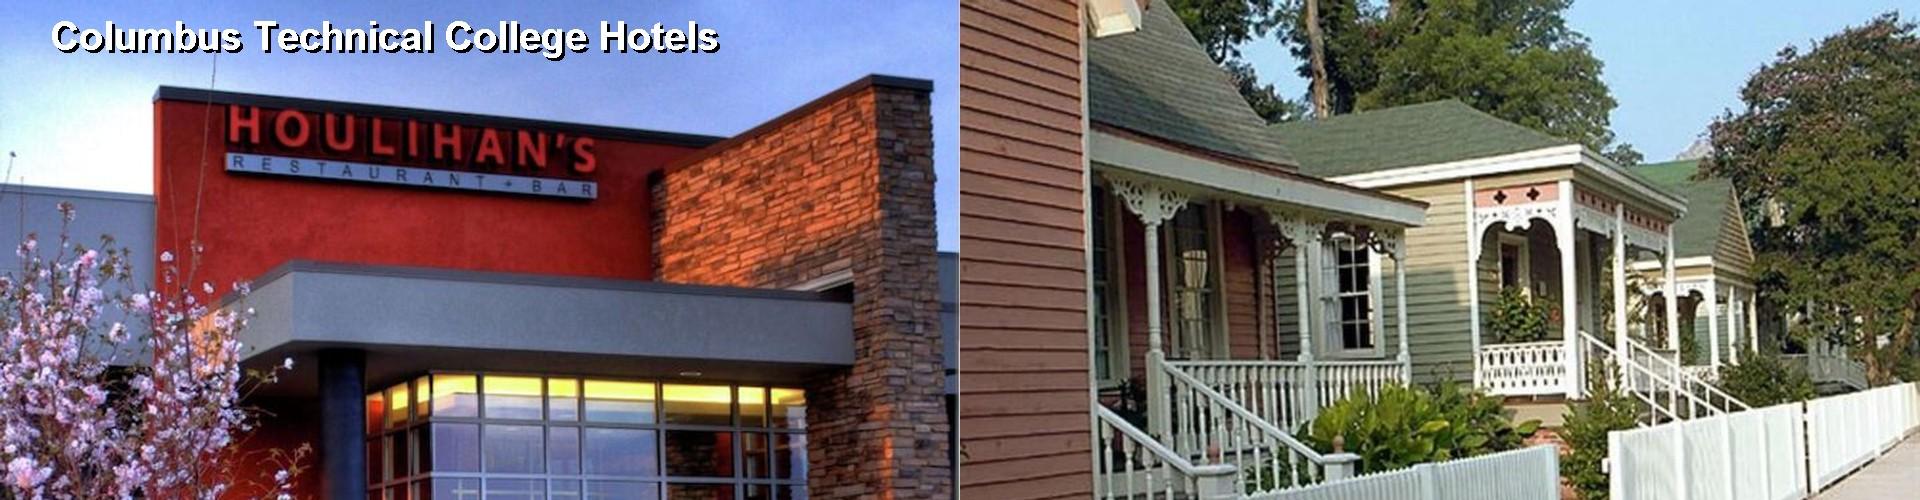 5 Best Hotels Near Columbus Technical College